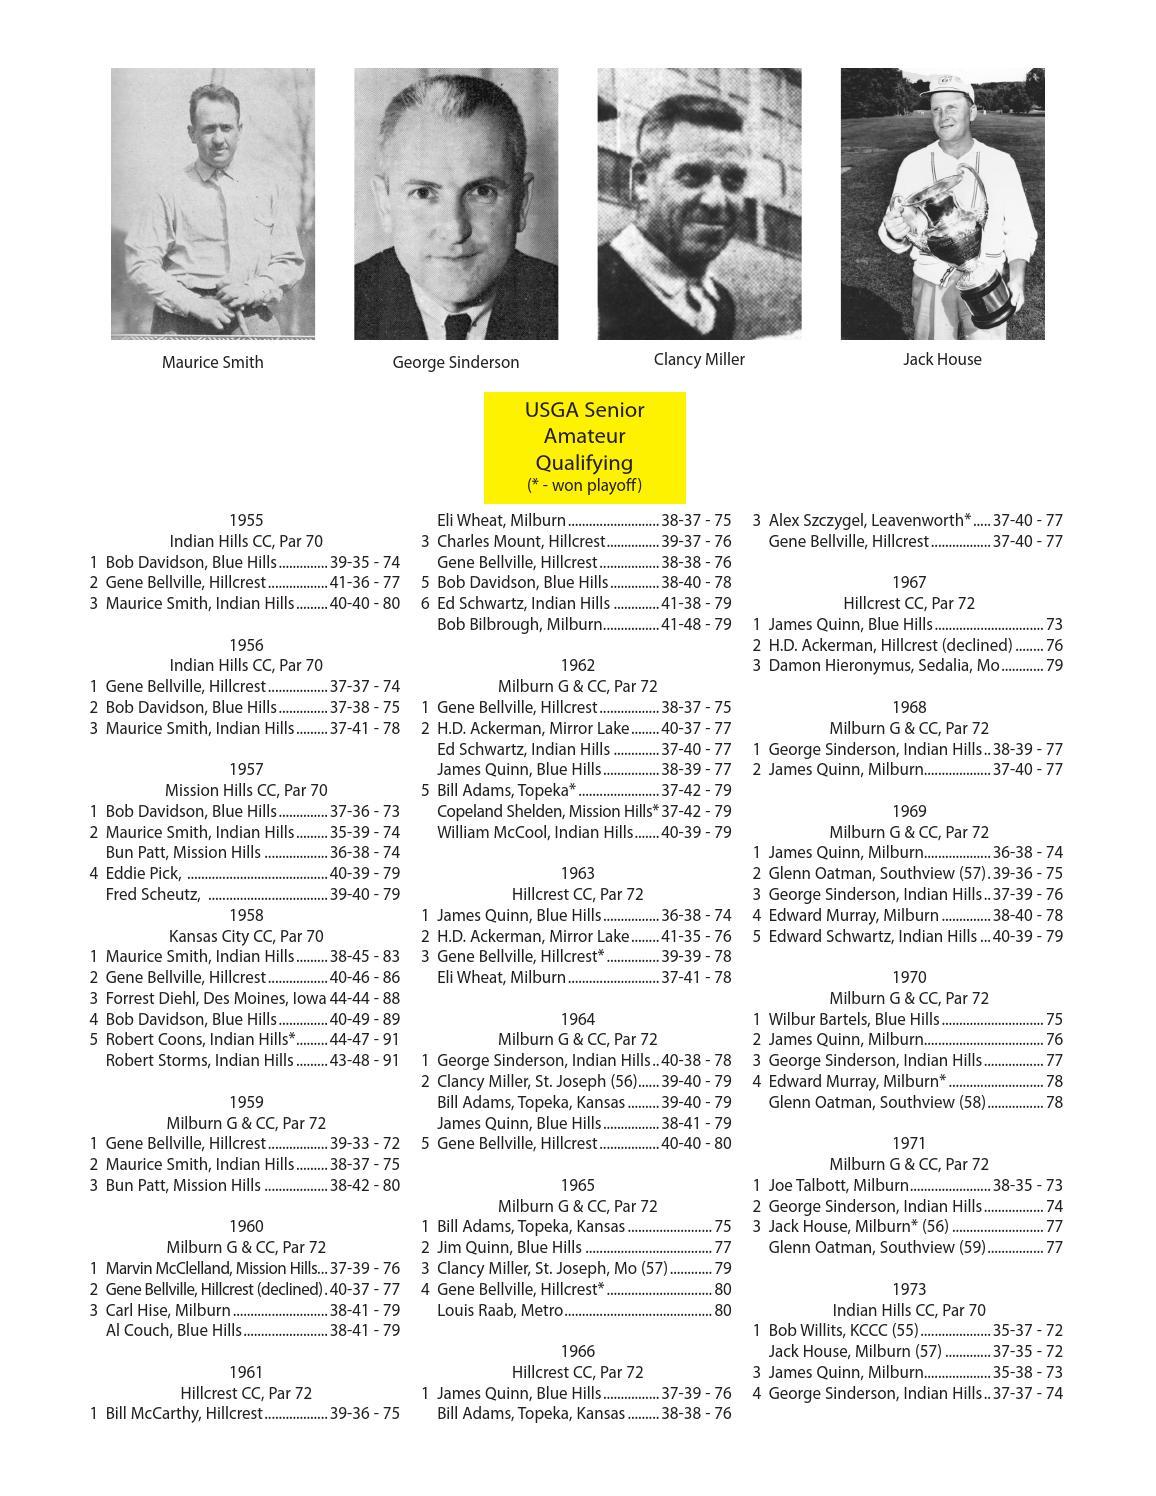 US Womens Amateur Public Links Qualifying History by Matt